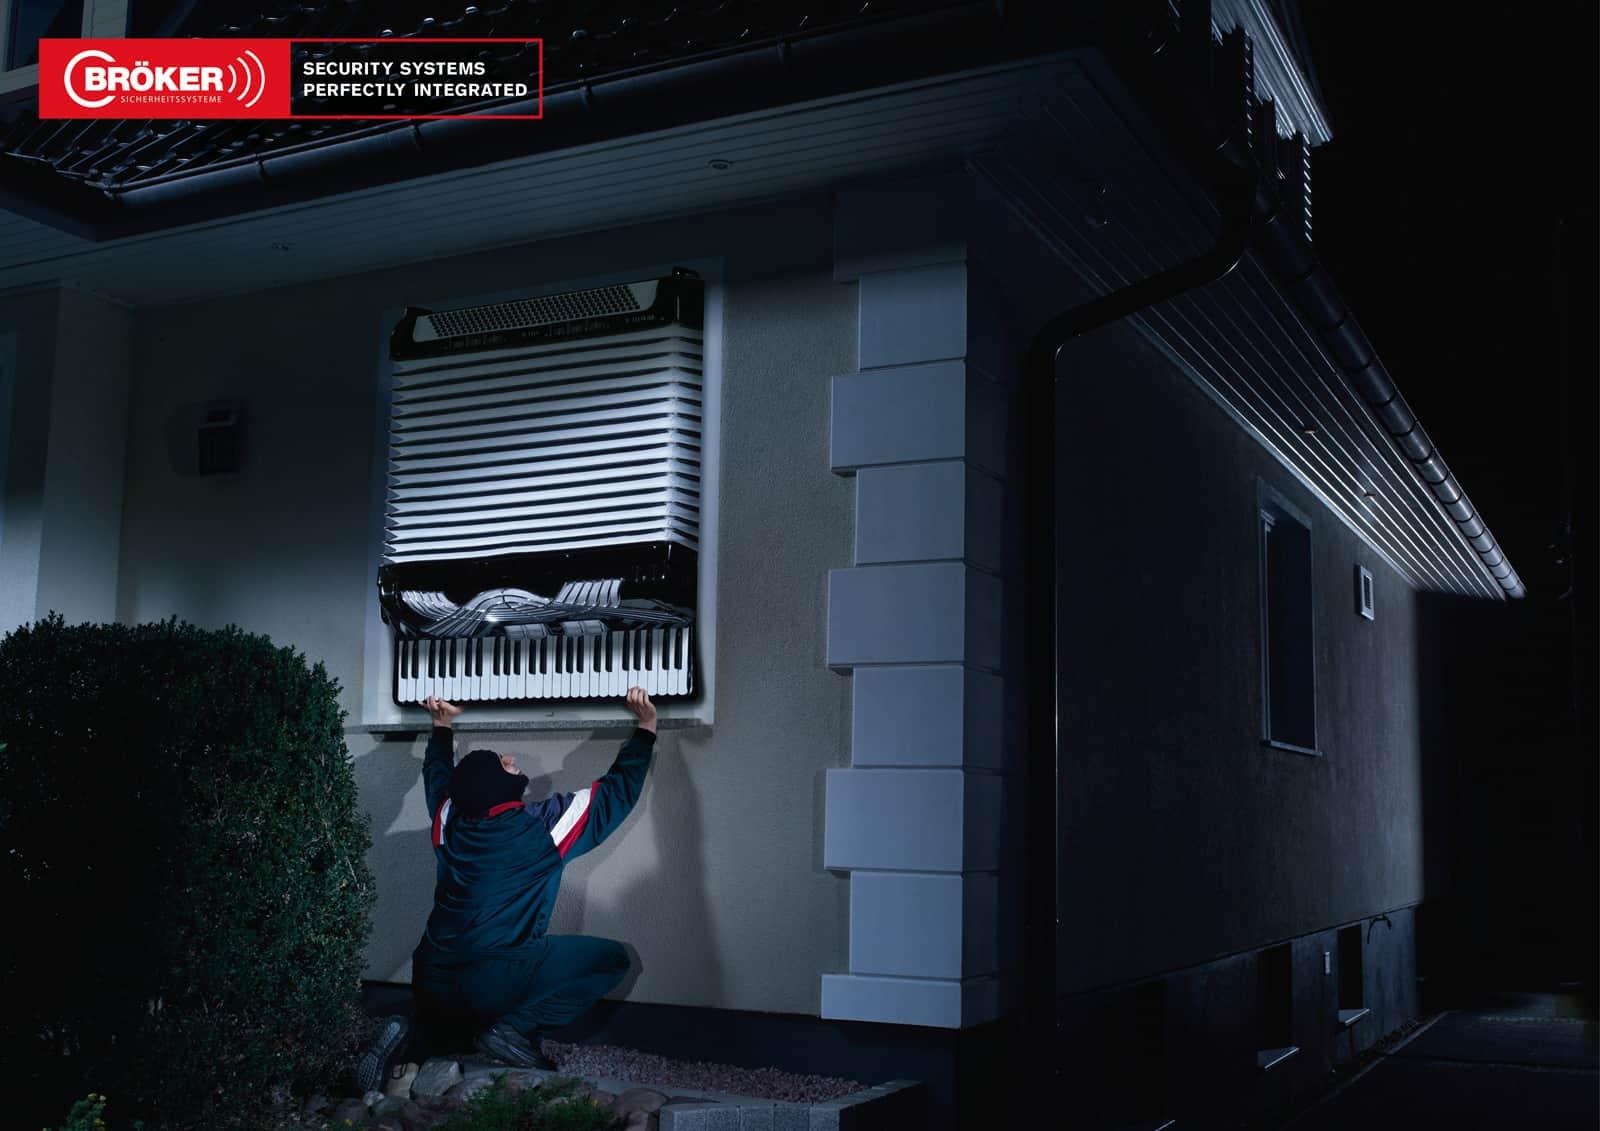 Pub Bröker : accordéon